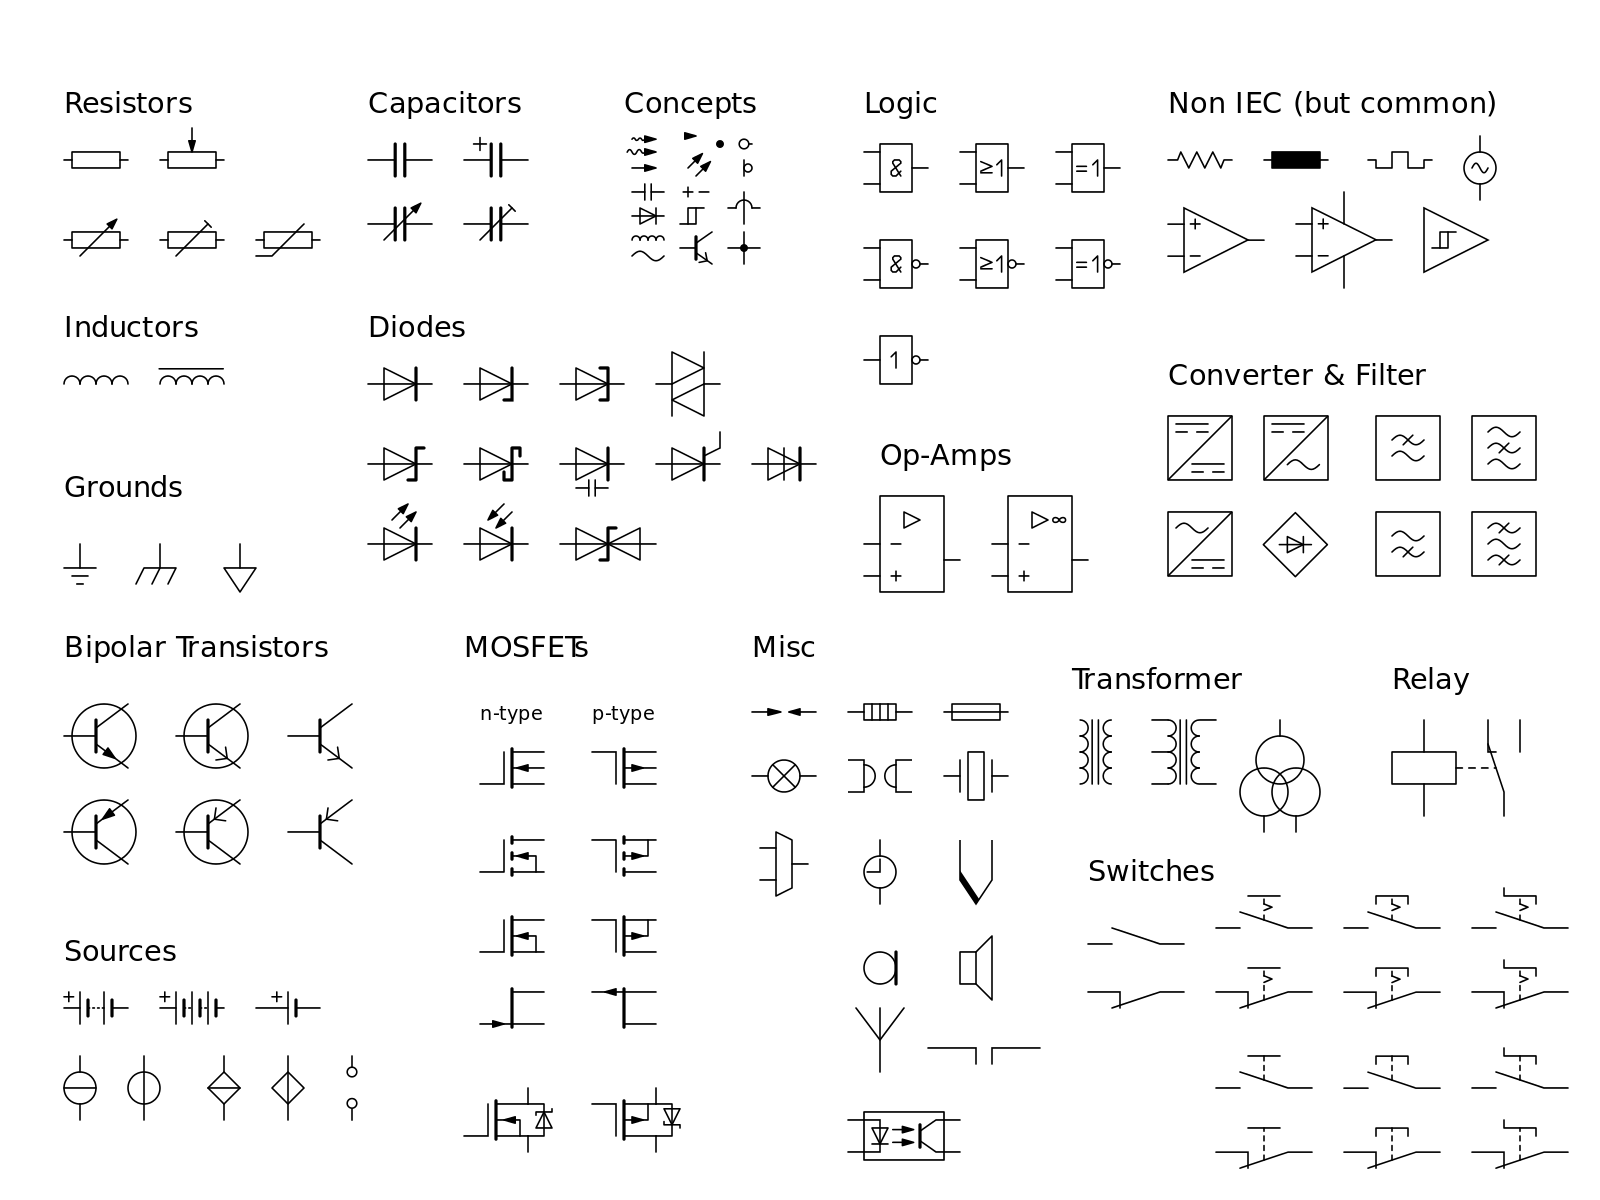 iec electrical wiring symbols diagram data schema iec wiring diagram symbols